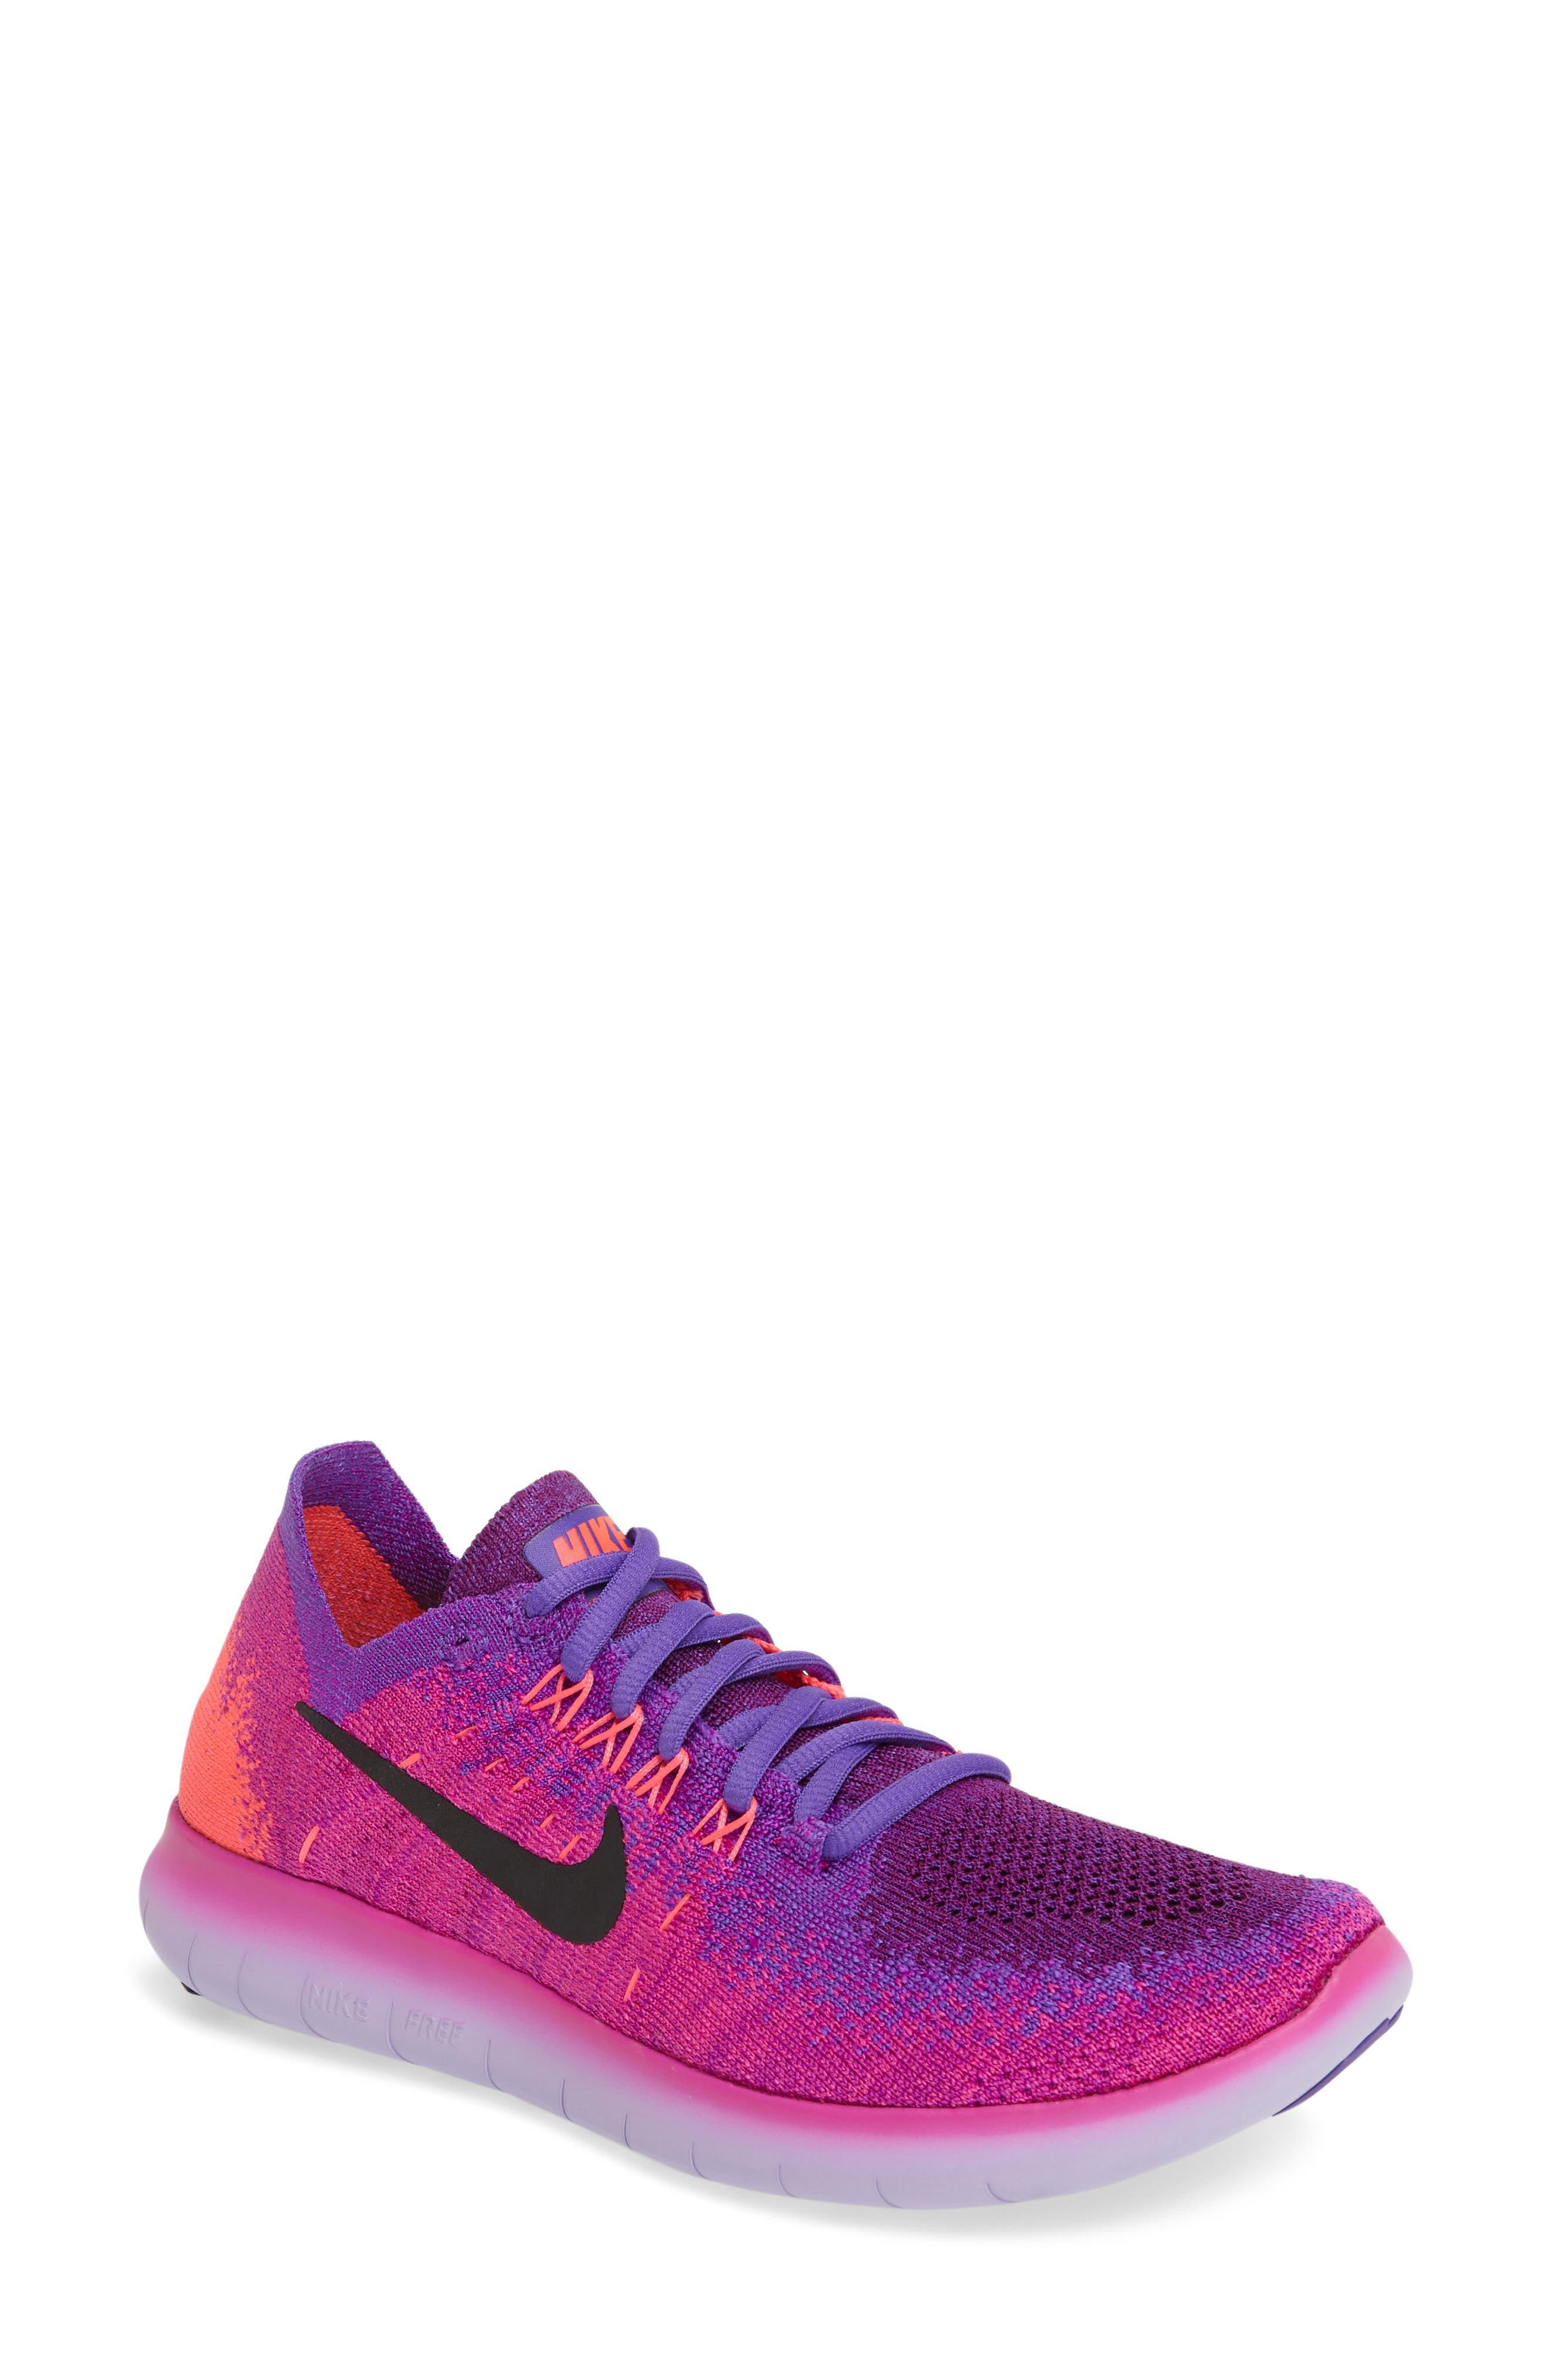 Alternate Image 1 Selected - Nike Free RN Flyknit 2 Running Shoe (Women)